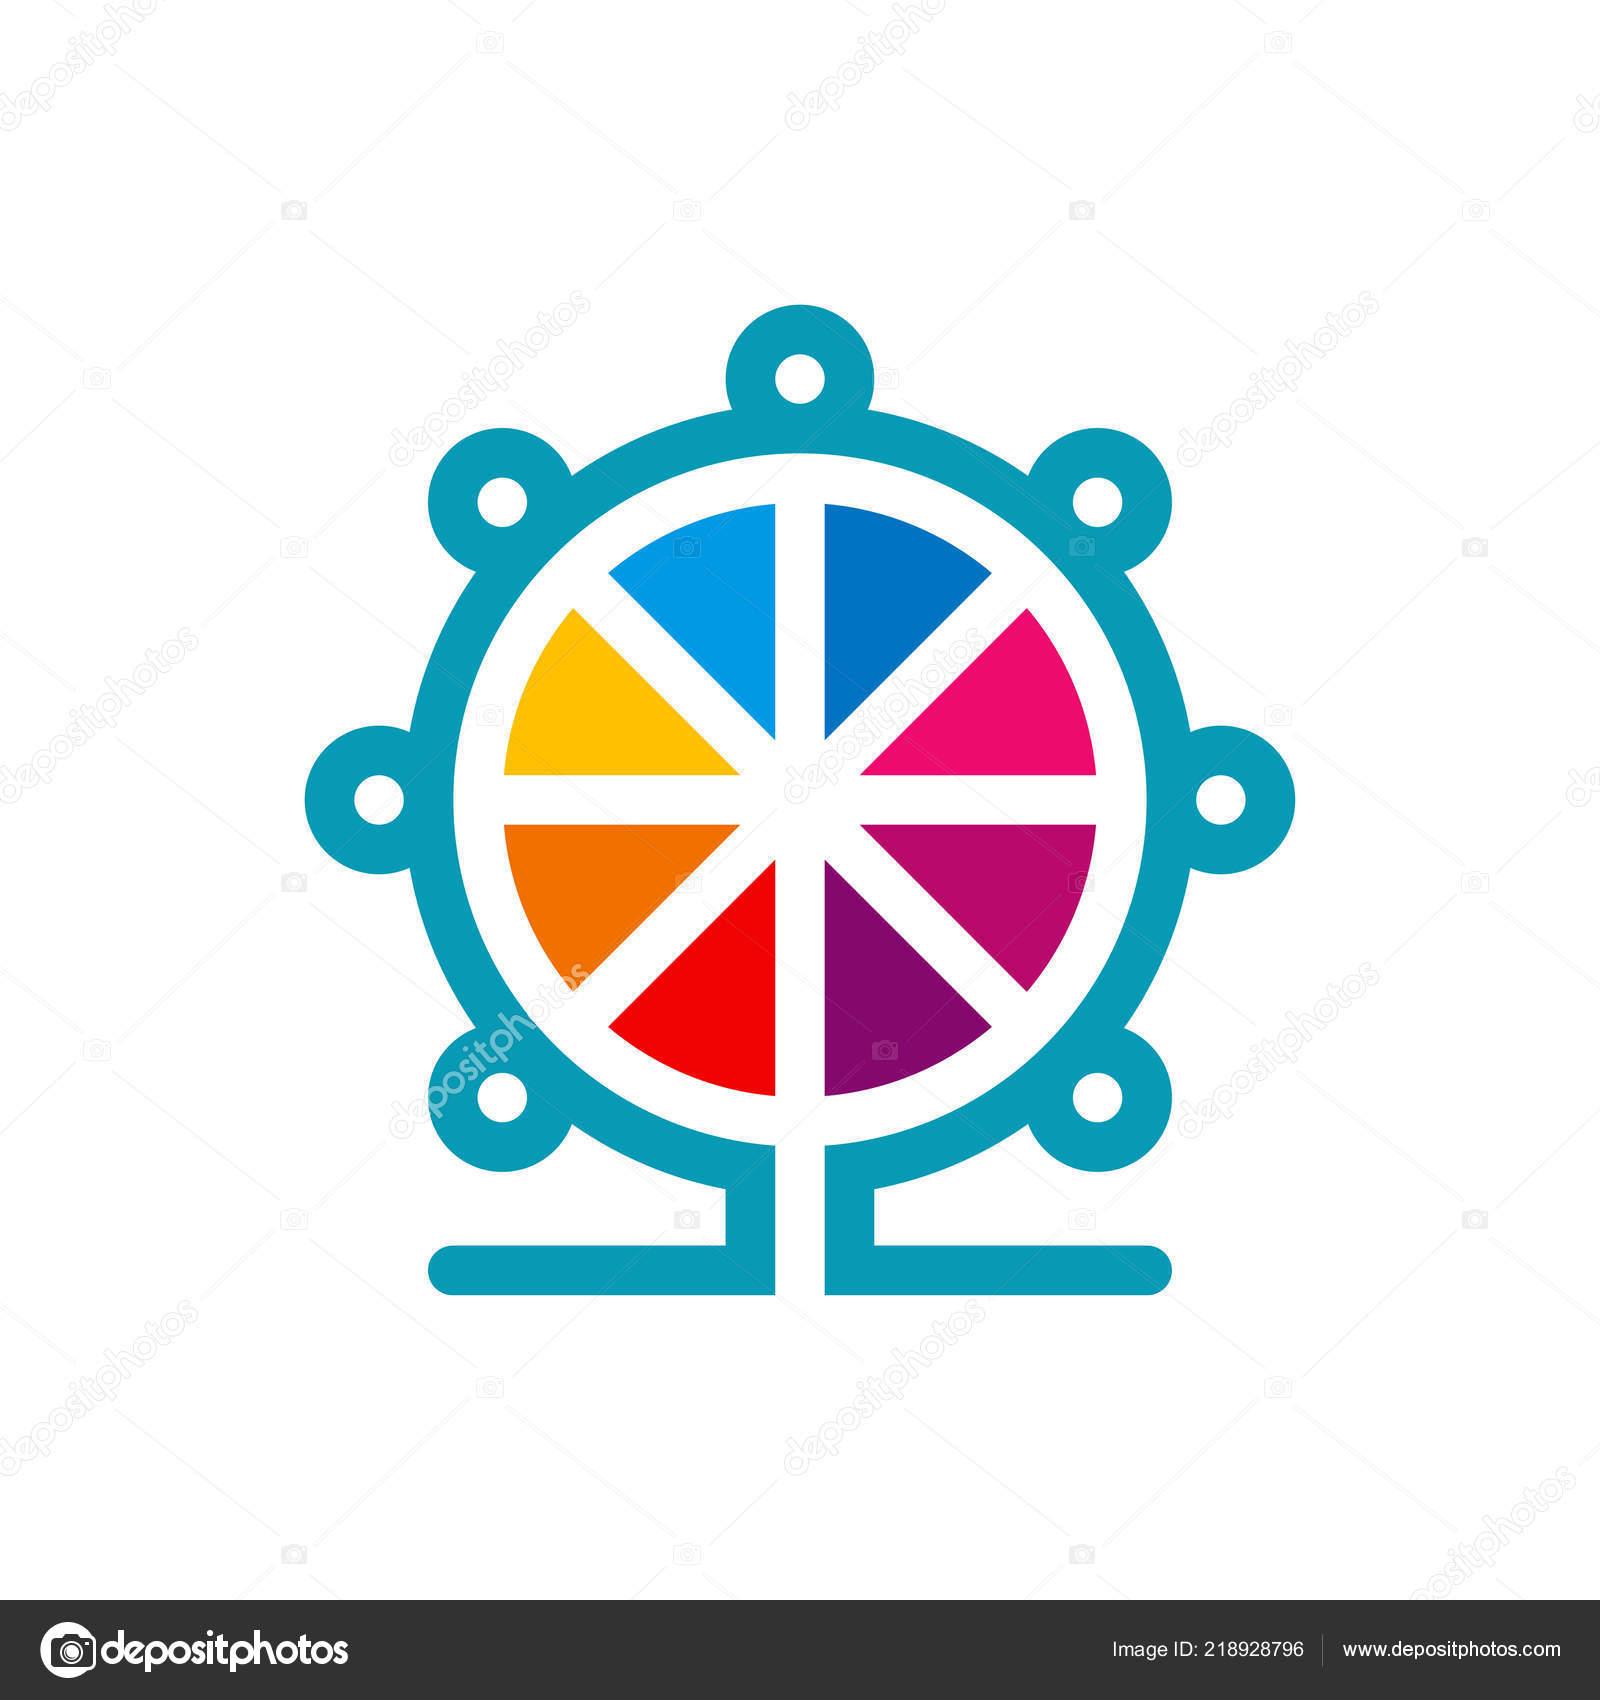 Renkli Donme Dolap Logo Sablonu Vektor Cizim Stok Vektor